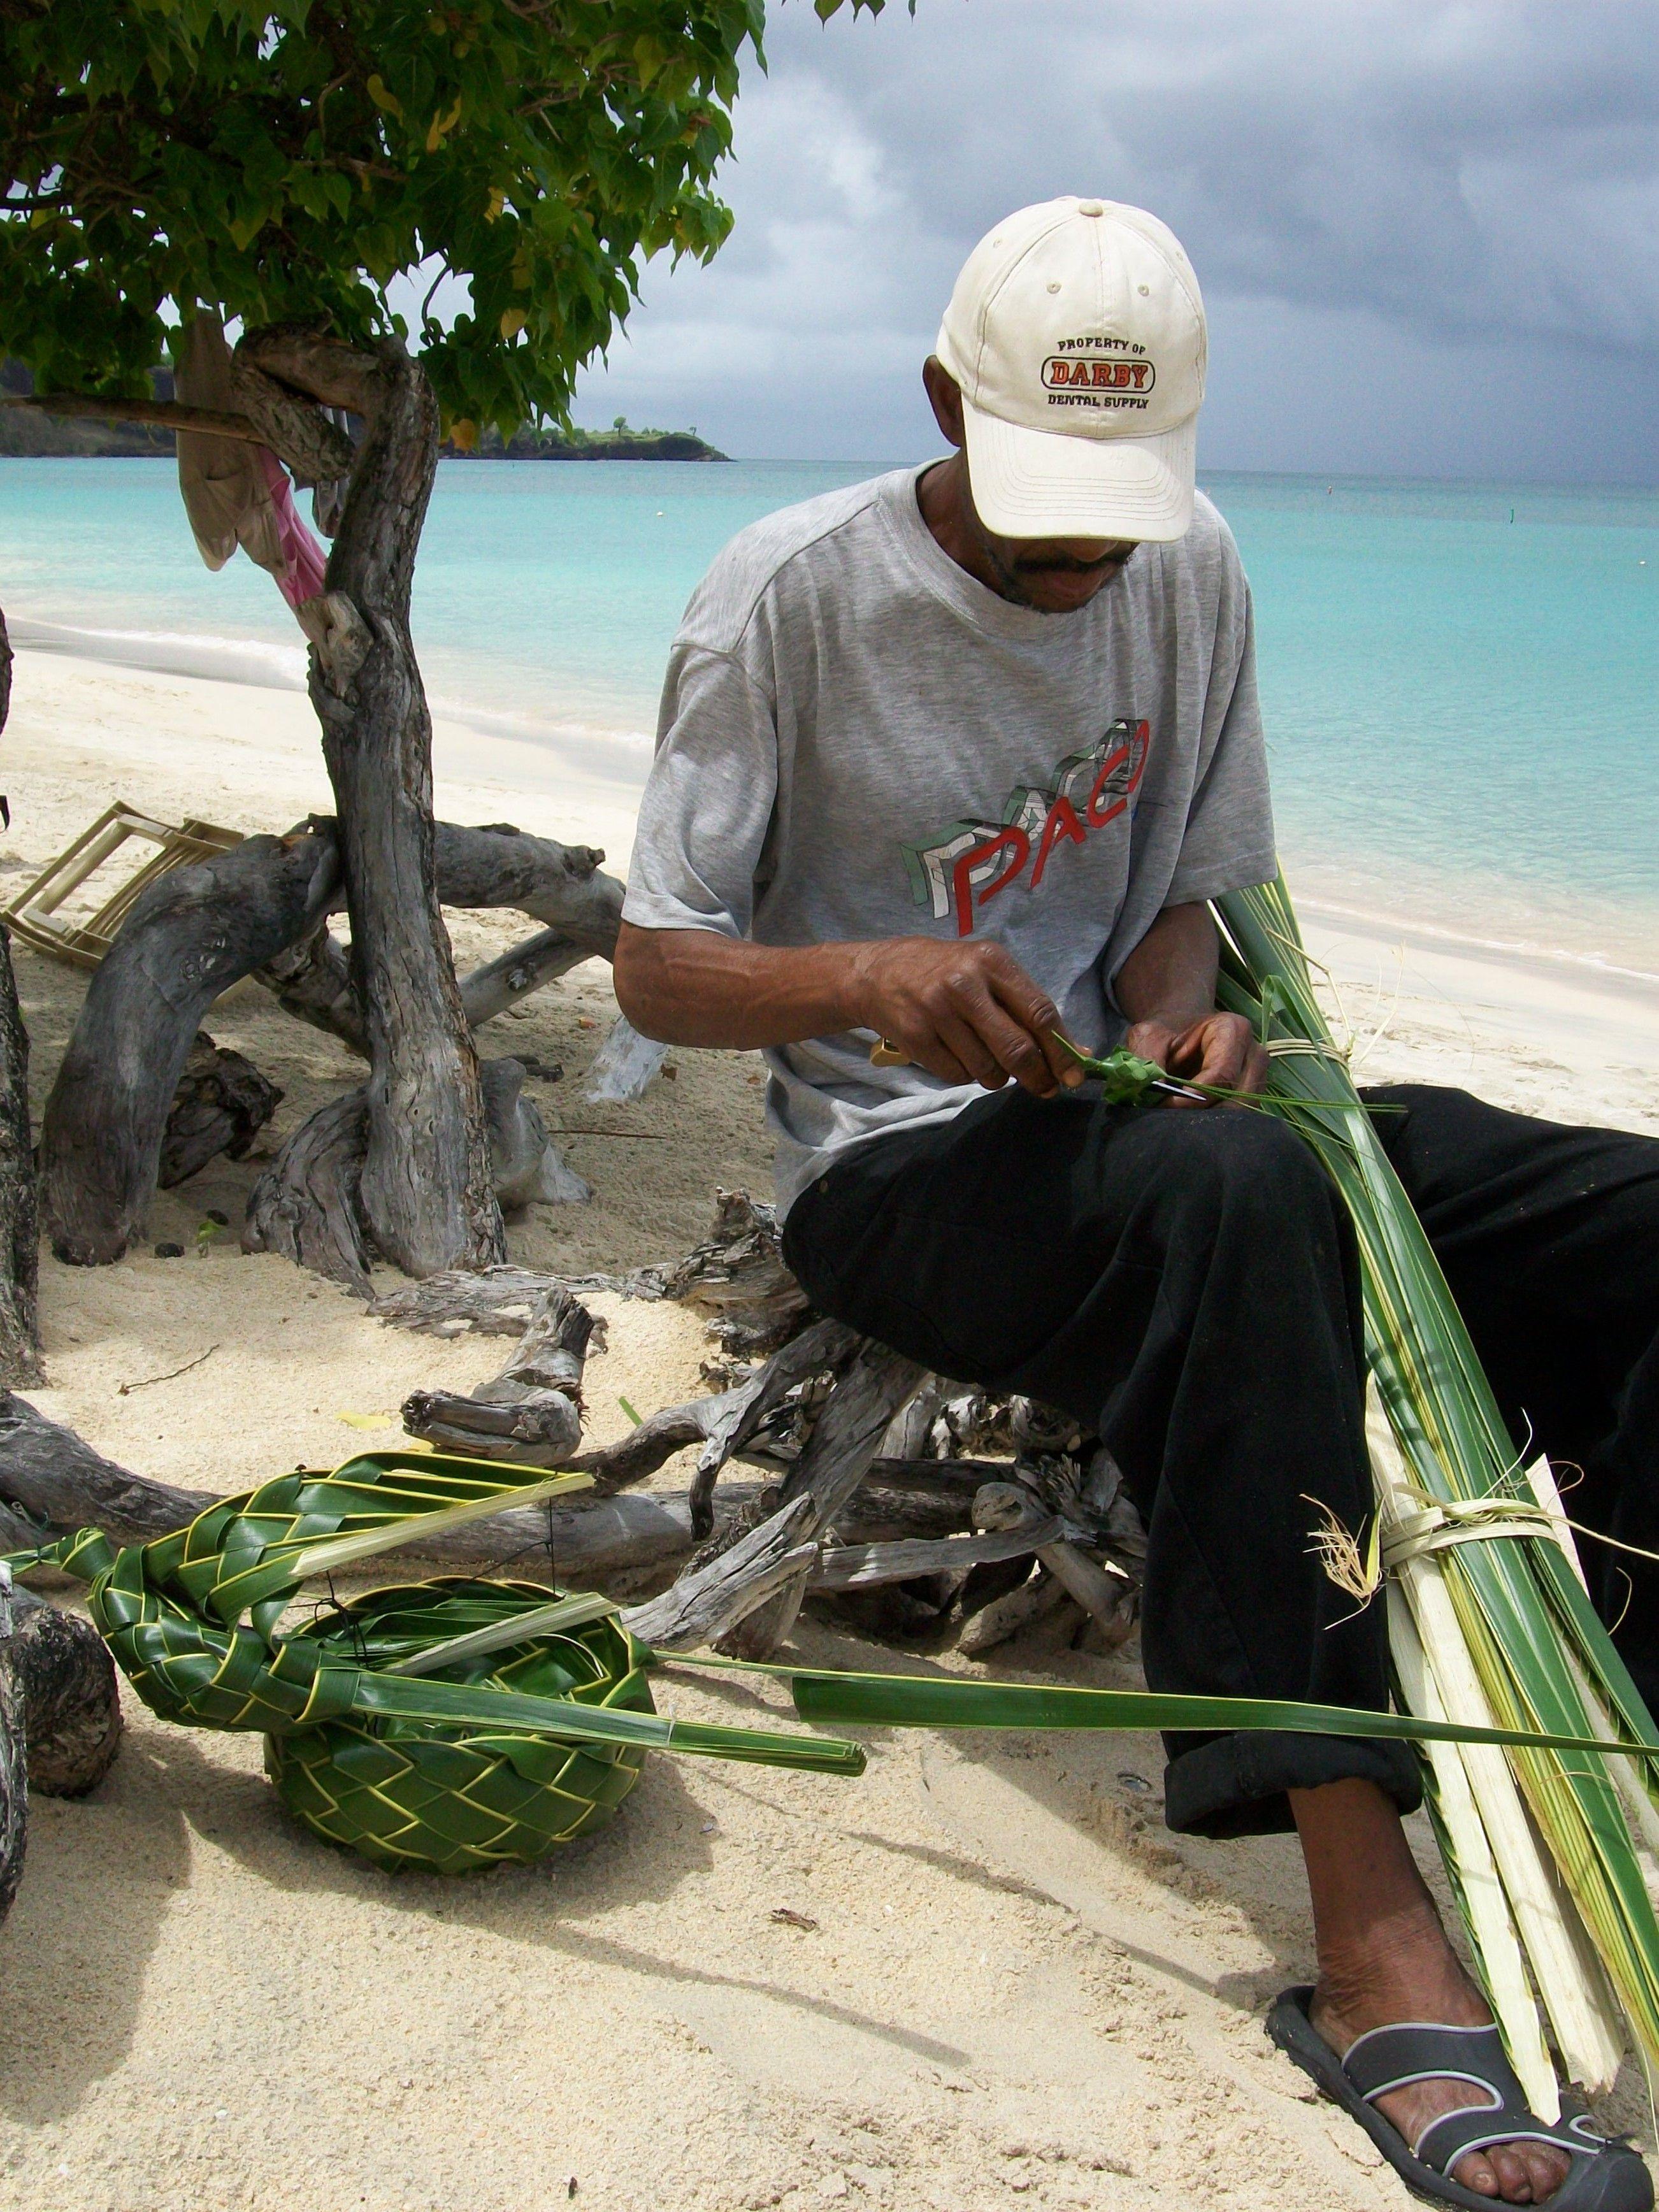 Basket Weaving, Grenada, Caribbean (With images) Grenada